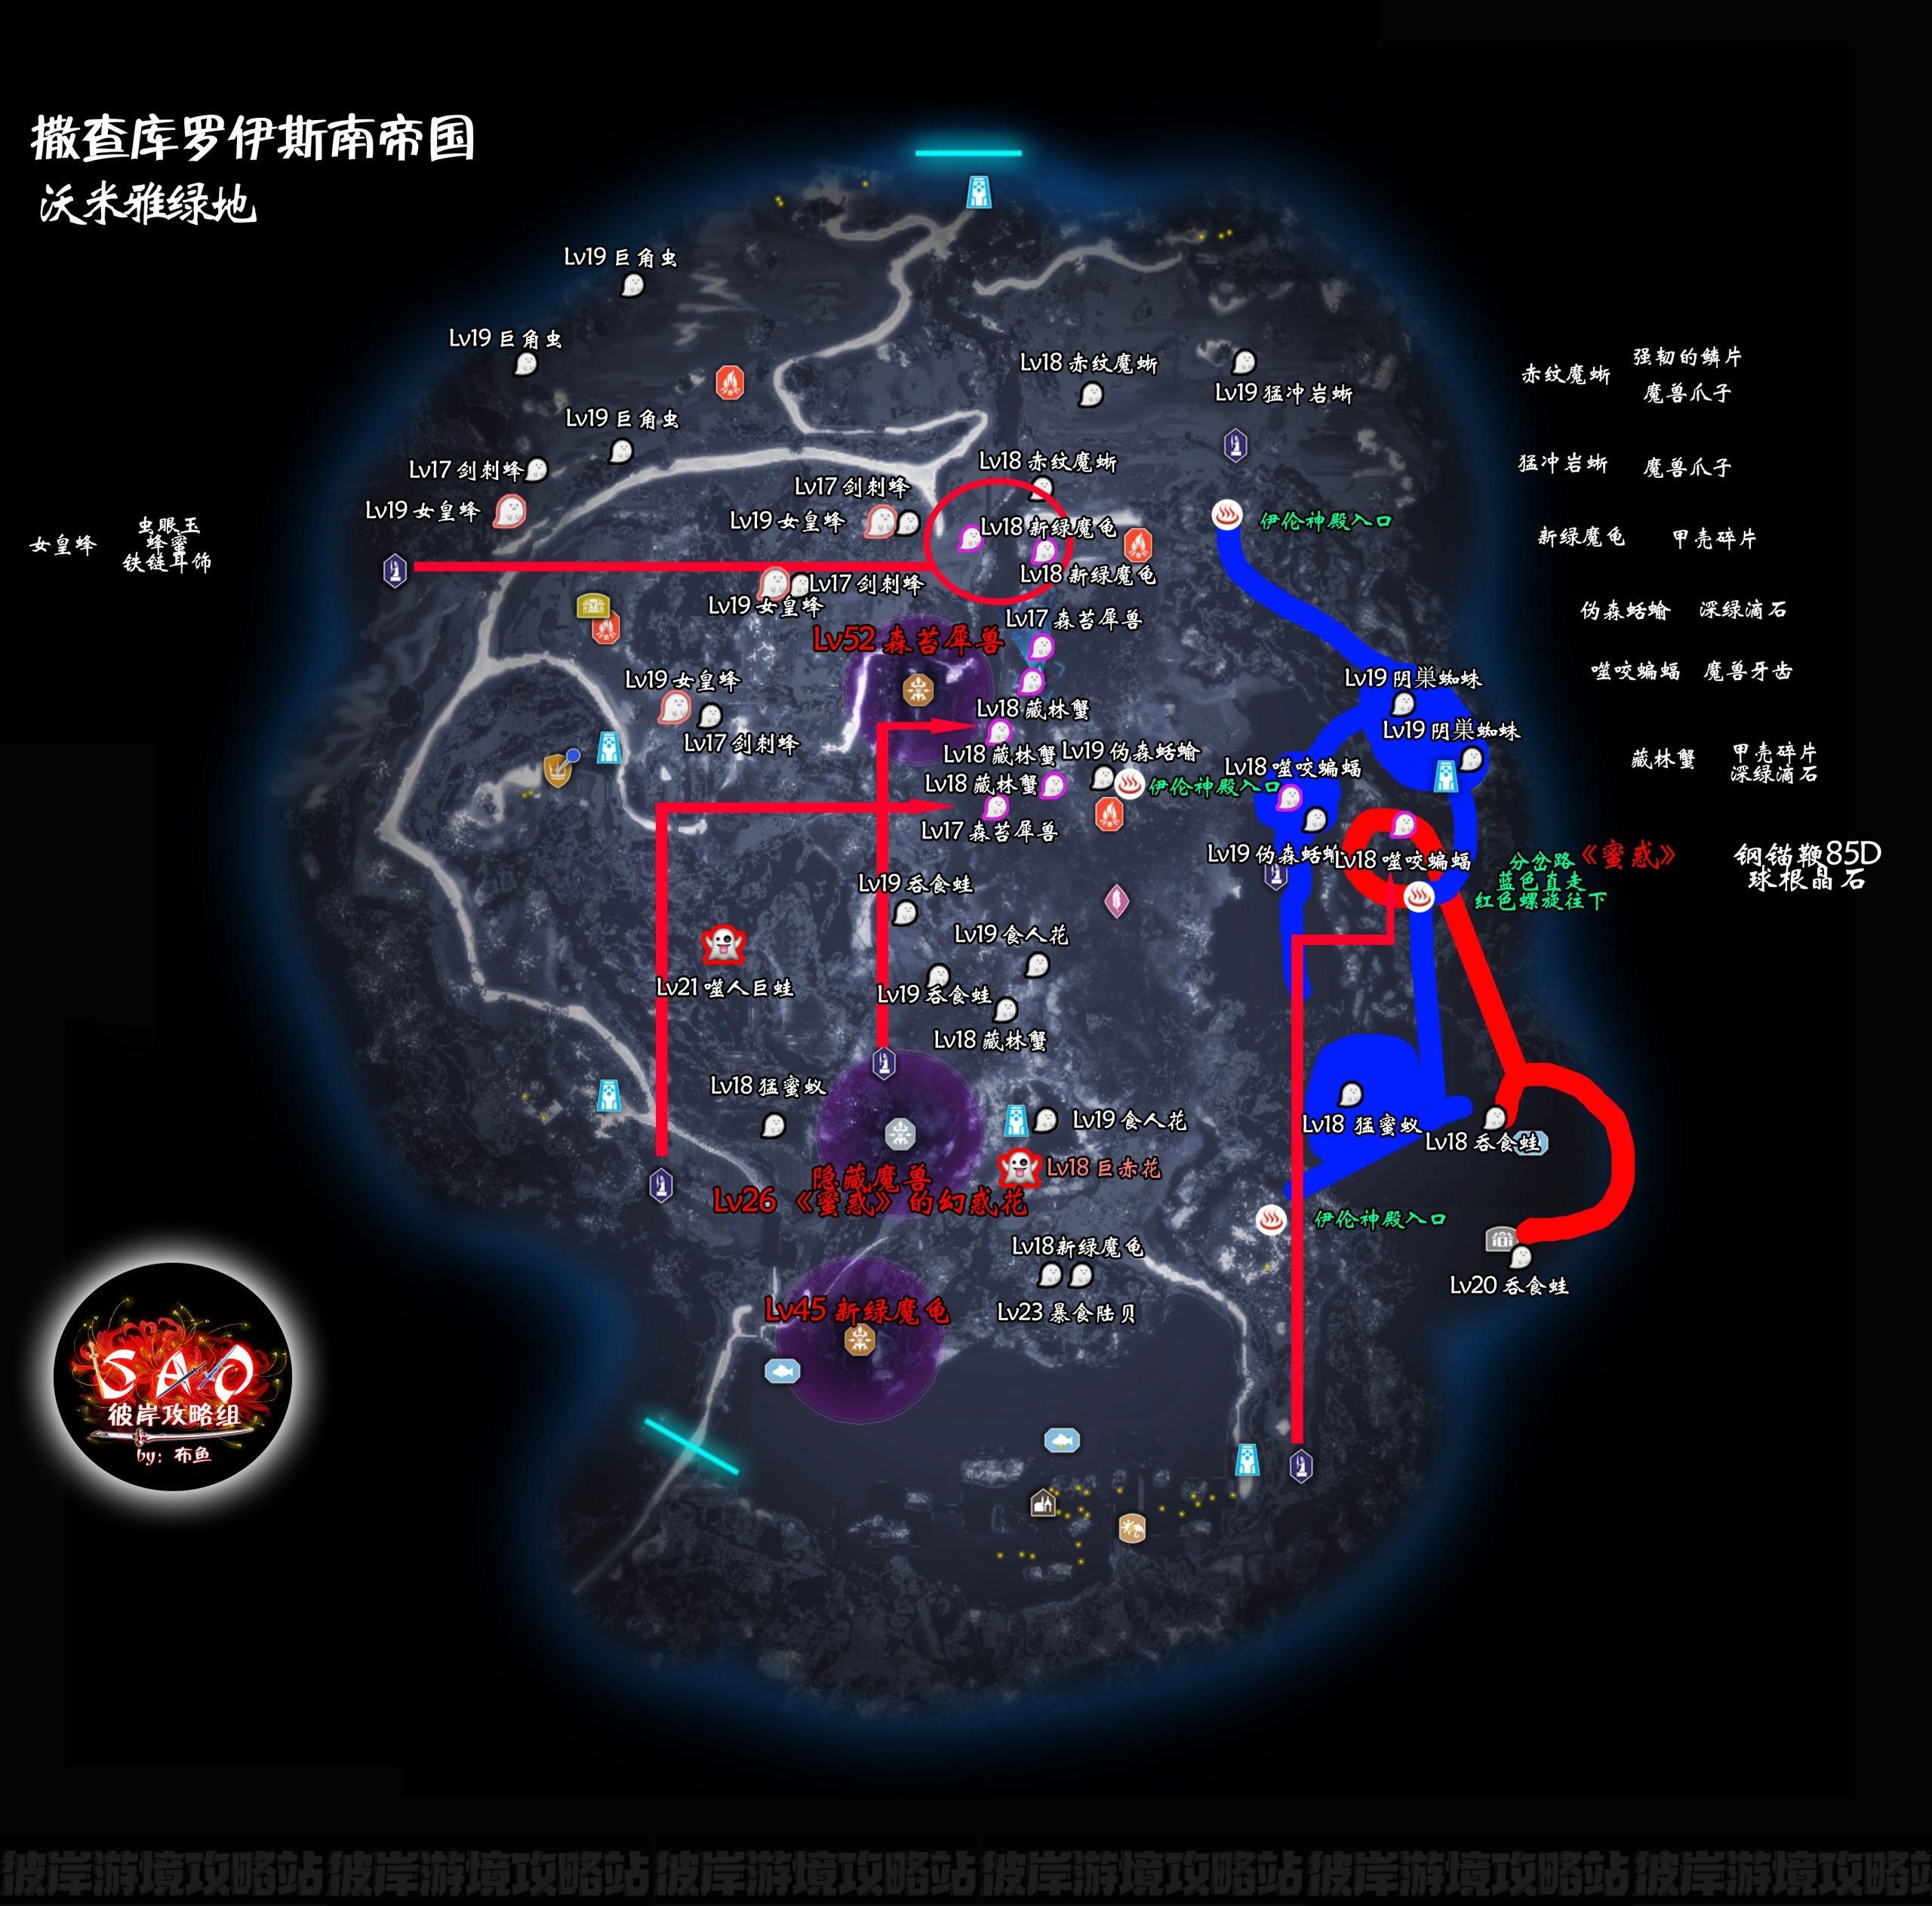 【SAOAL攻略组】超完全流程地图攻略及新手指引-沃米雅绿地篇-刀剑神域彼岸游境攻略站